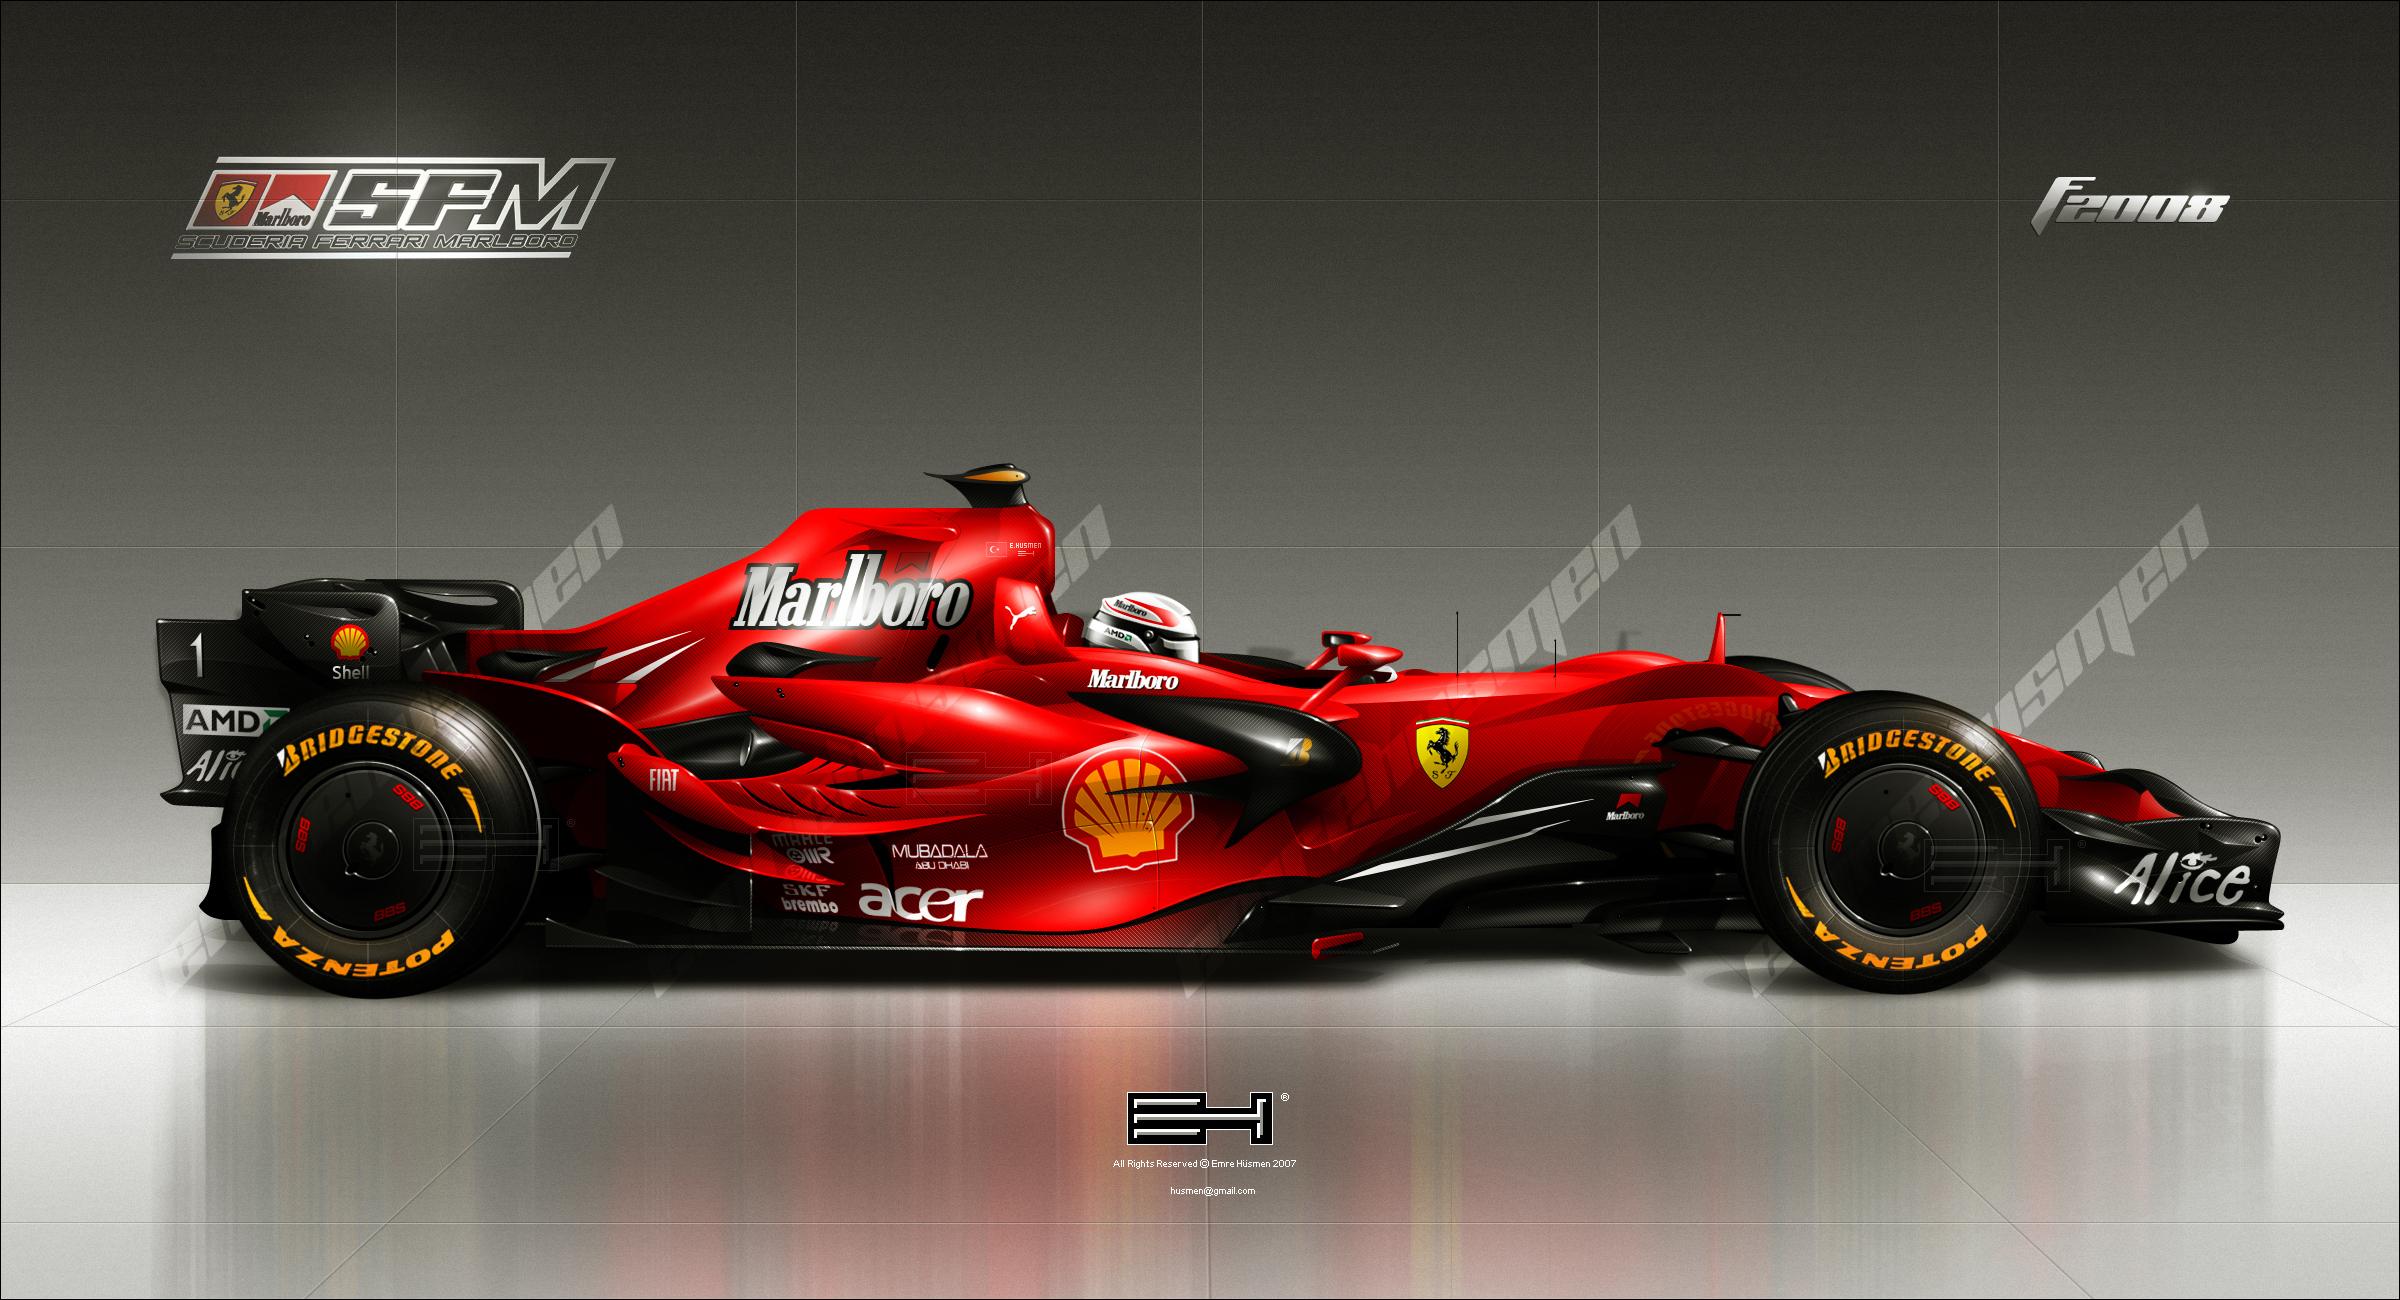 2018 Ferrari SF71H Wallpapers amp HD Images  WSupercars